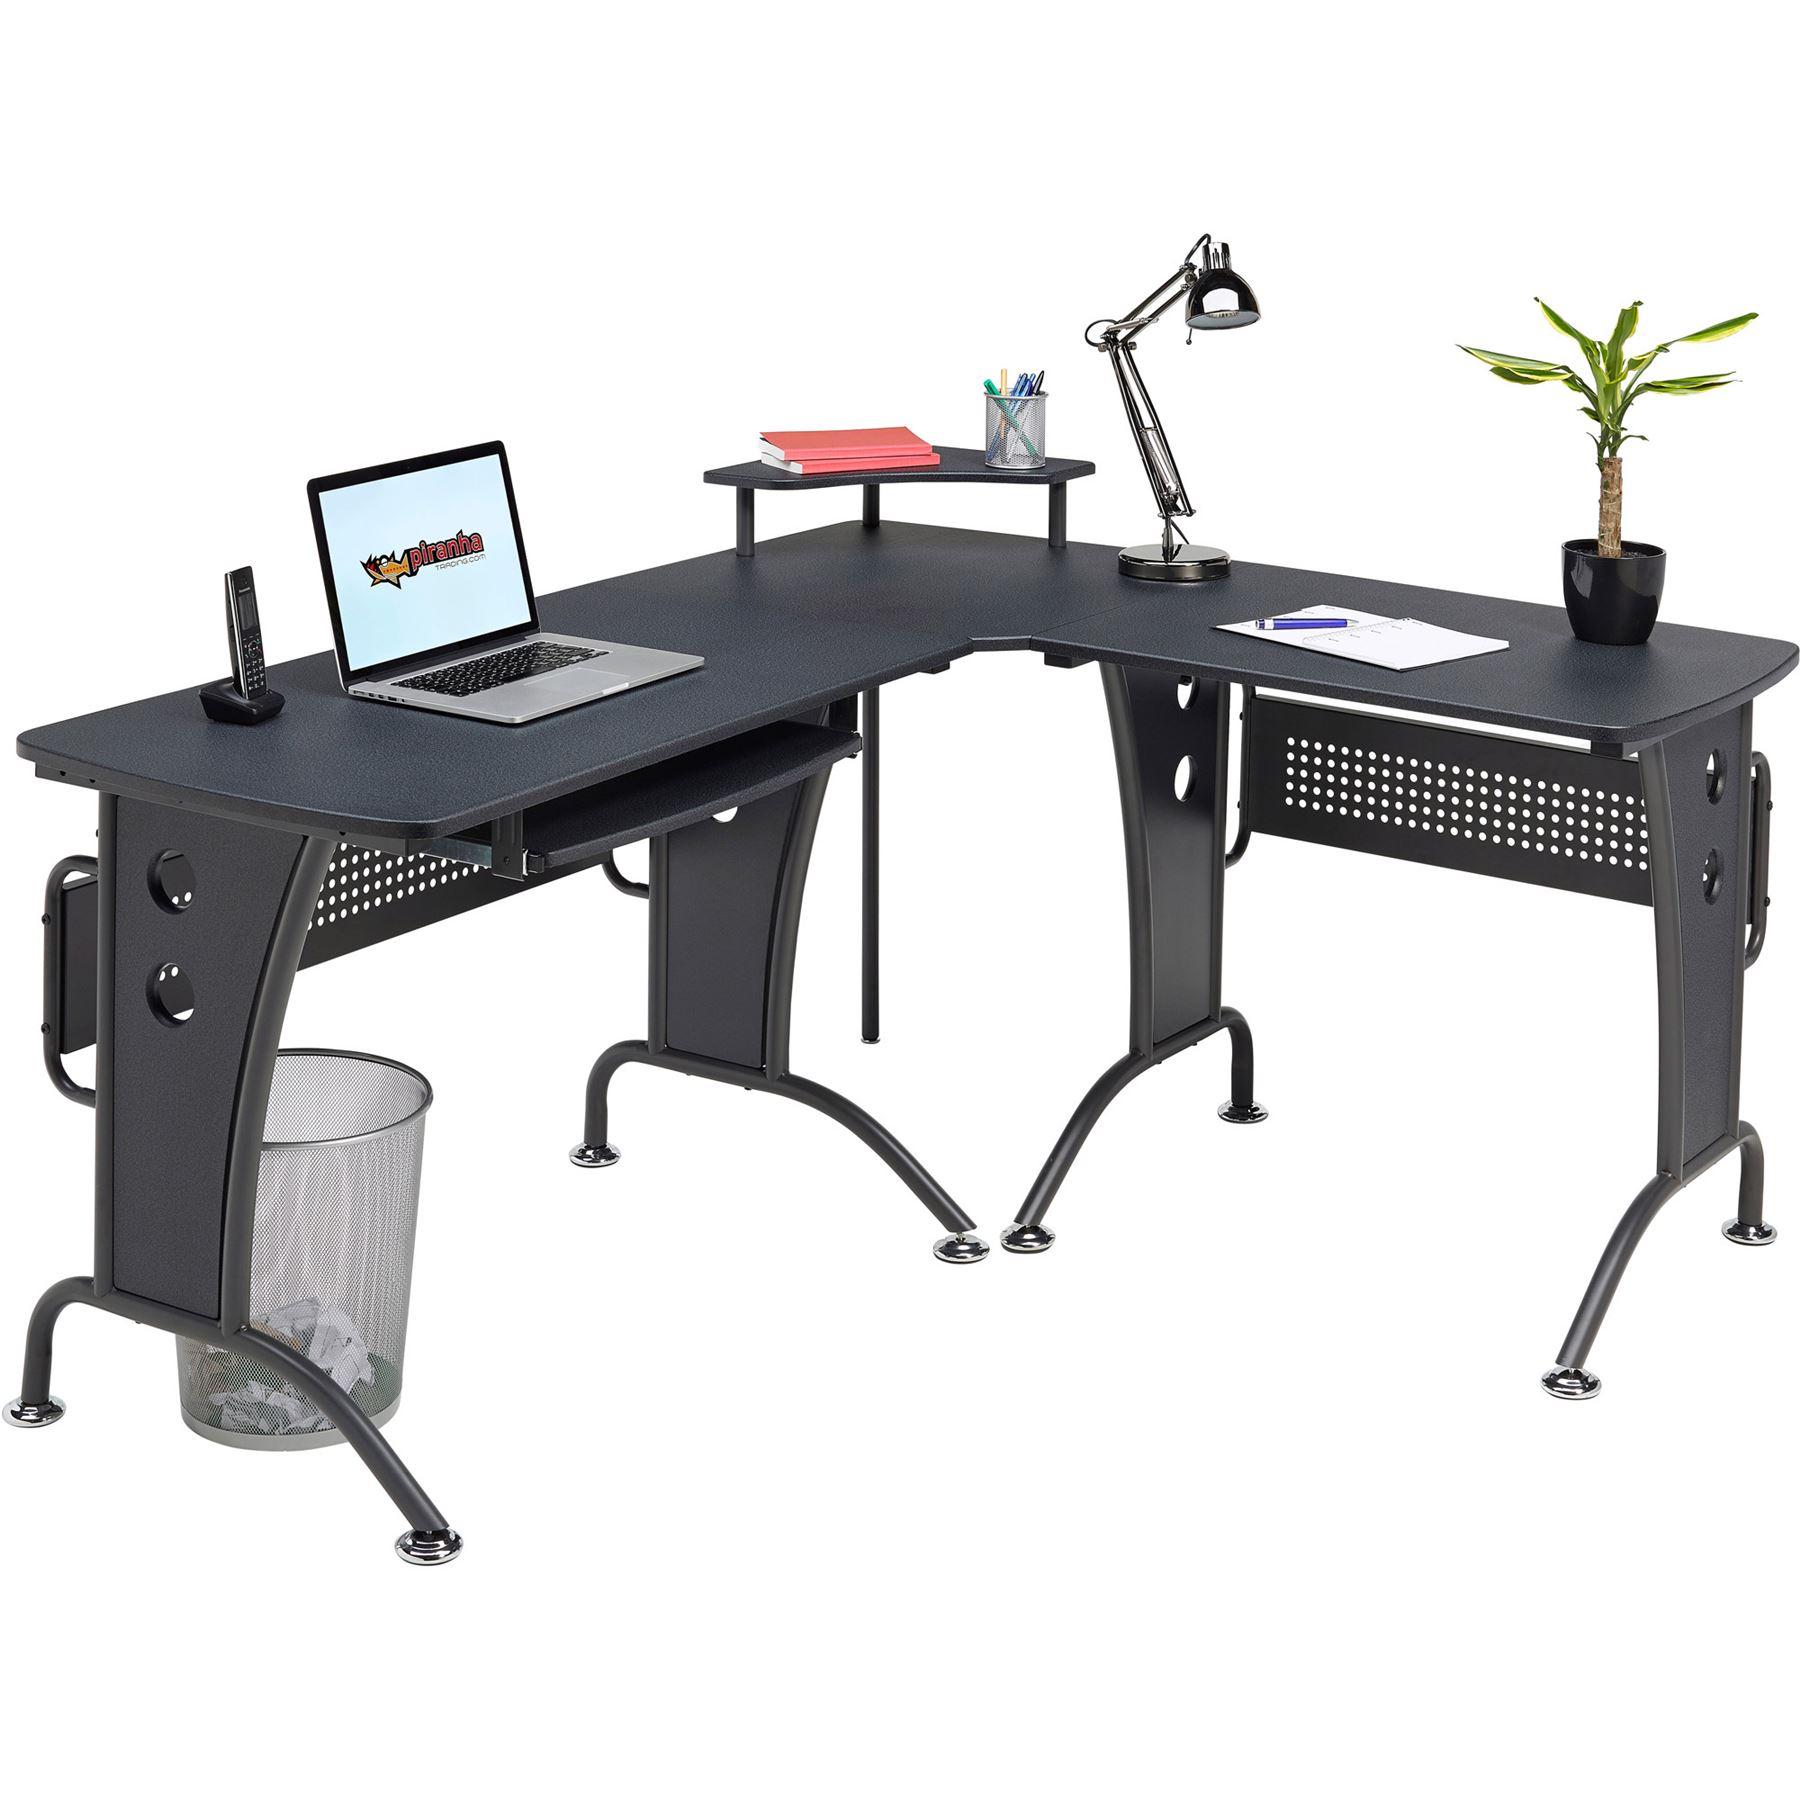 Large Corner Computer Desk With Keyboard Shelf Home Office